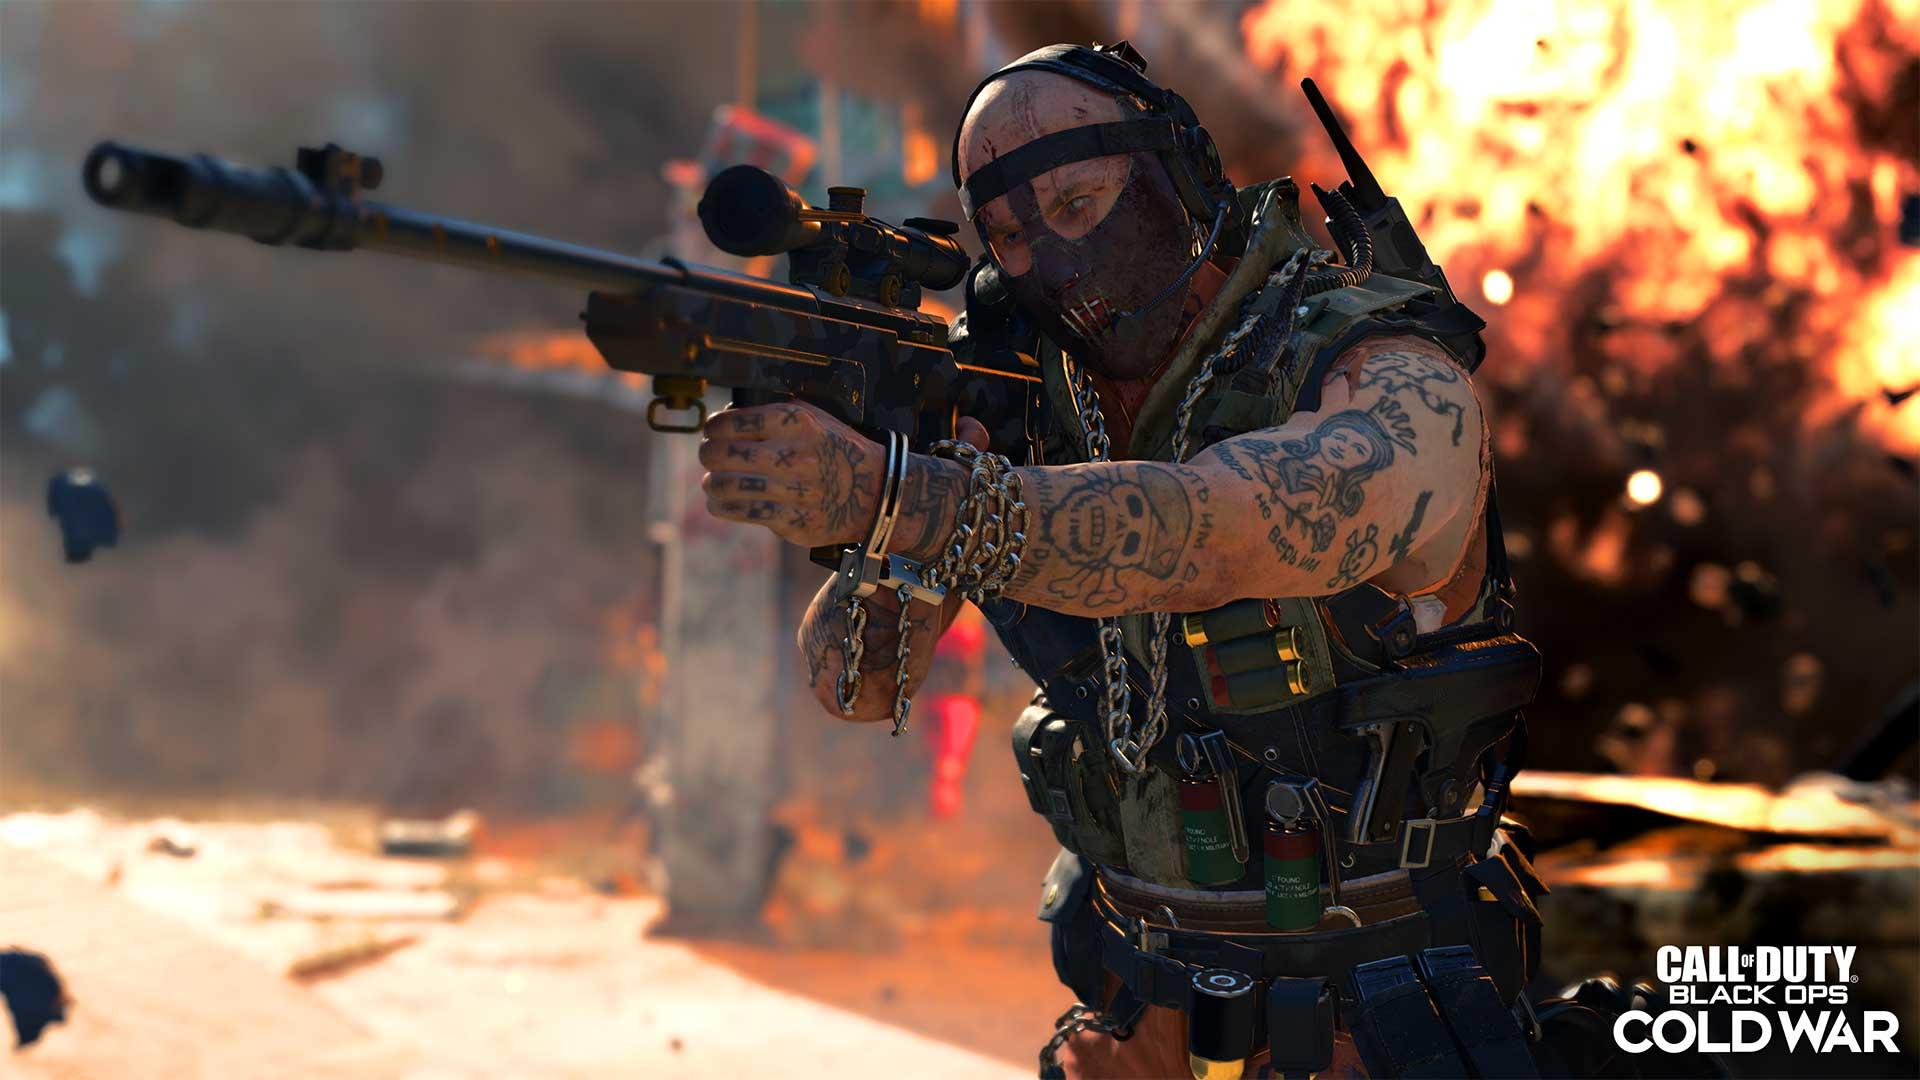 Screenhsot des Spiels Call of Duty: Black Ops Cold War Saison 1 zeigt den neuen Operator Stitch